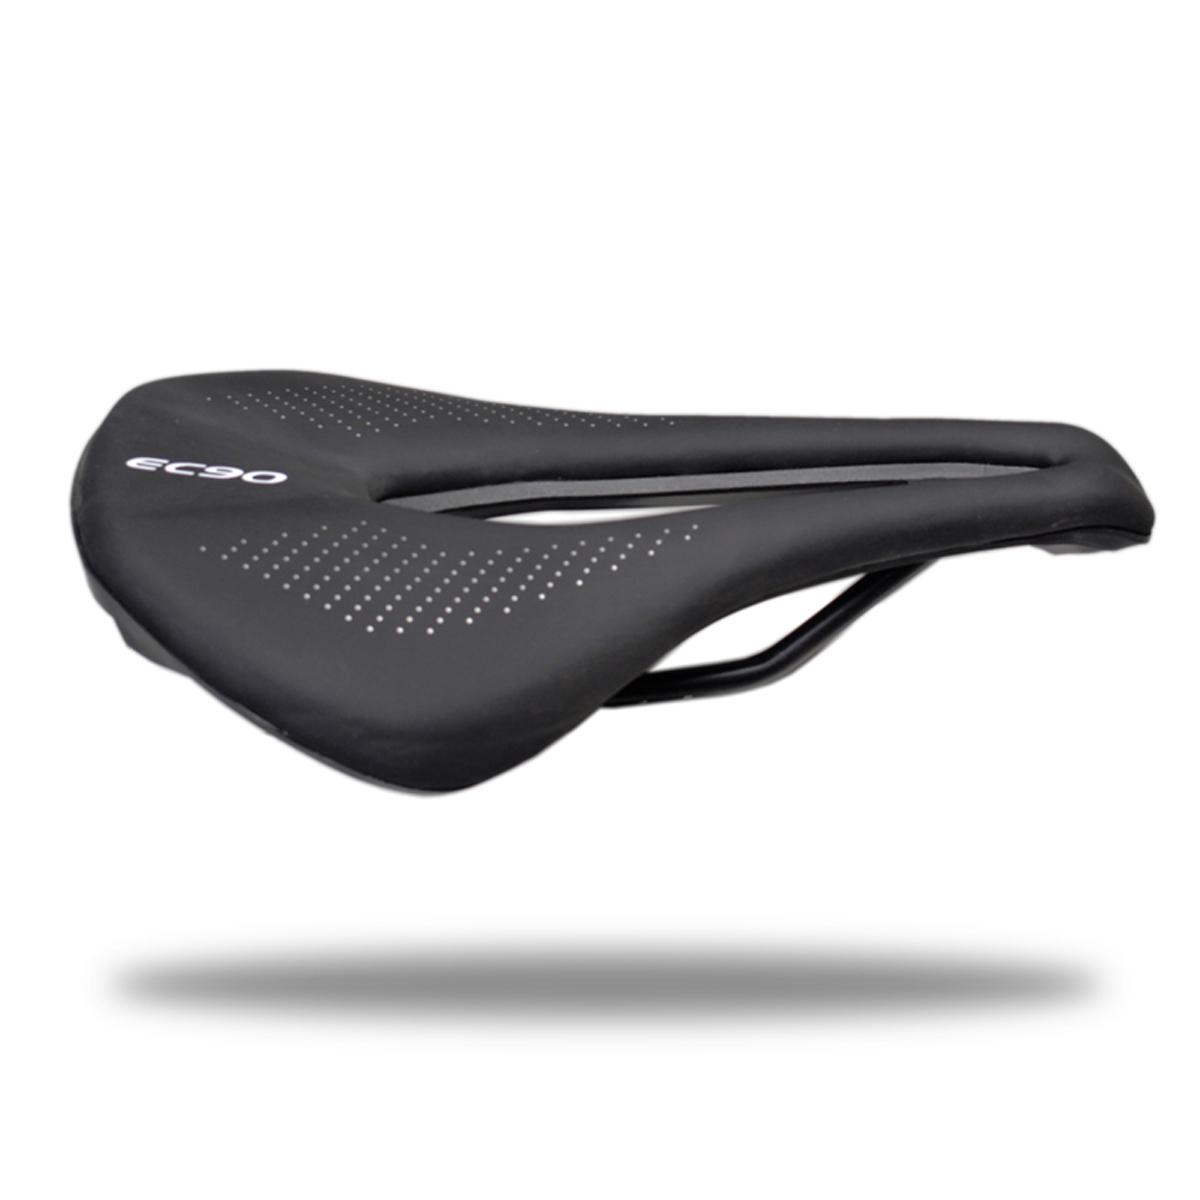 Gel PU Leather Bike Saddle Soft Comfort Spring Designed Bicycle Seat Cushion